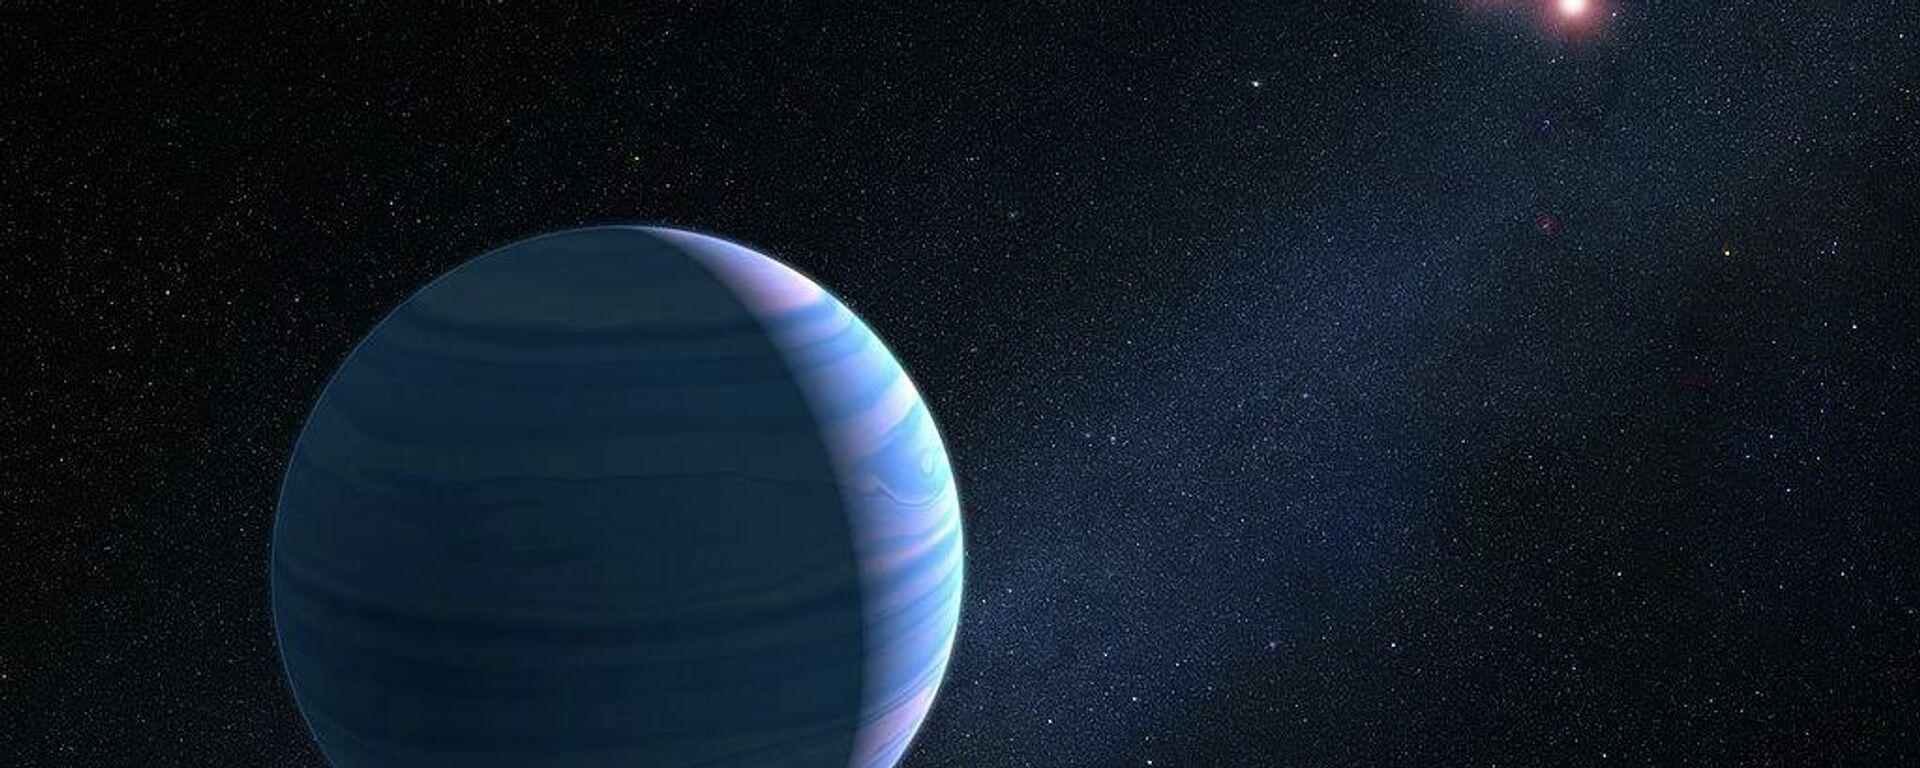 Exoplanet (Symbolbild) - SNA, 1920, 12.02.2021